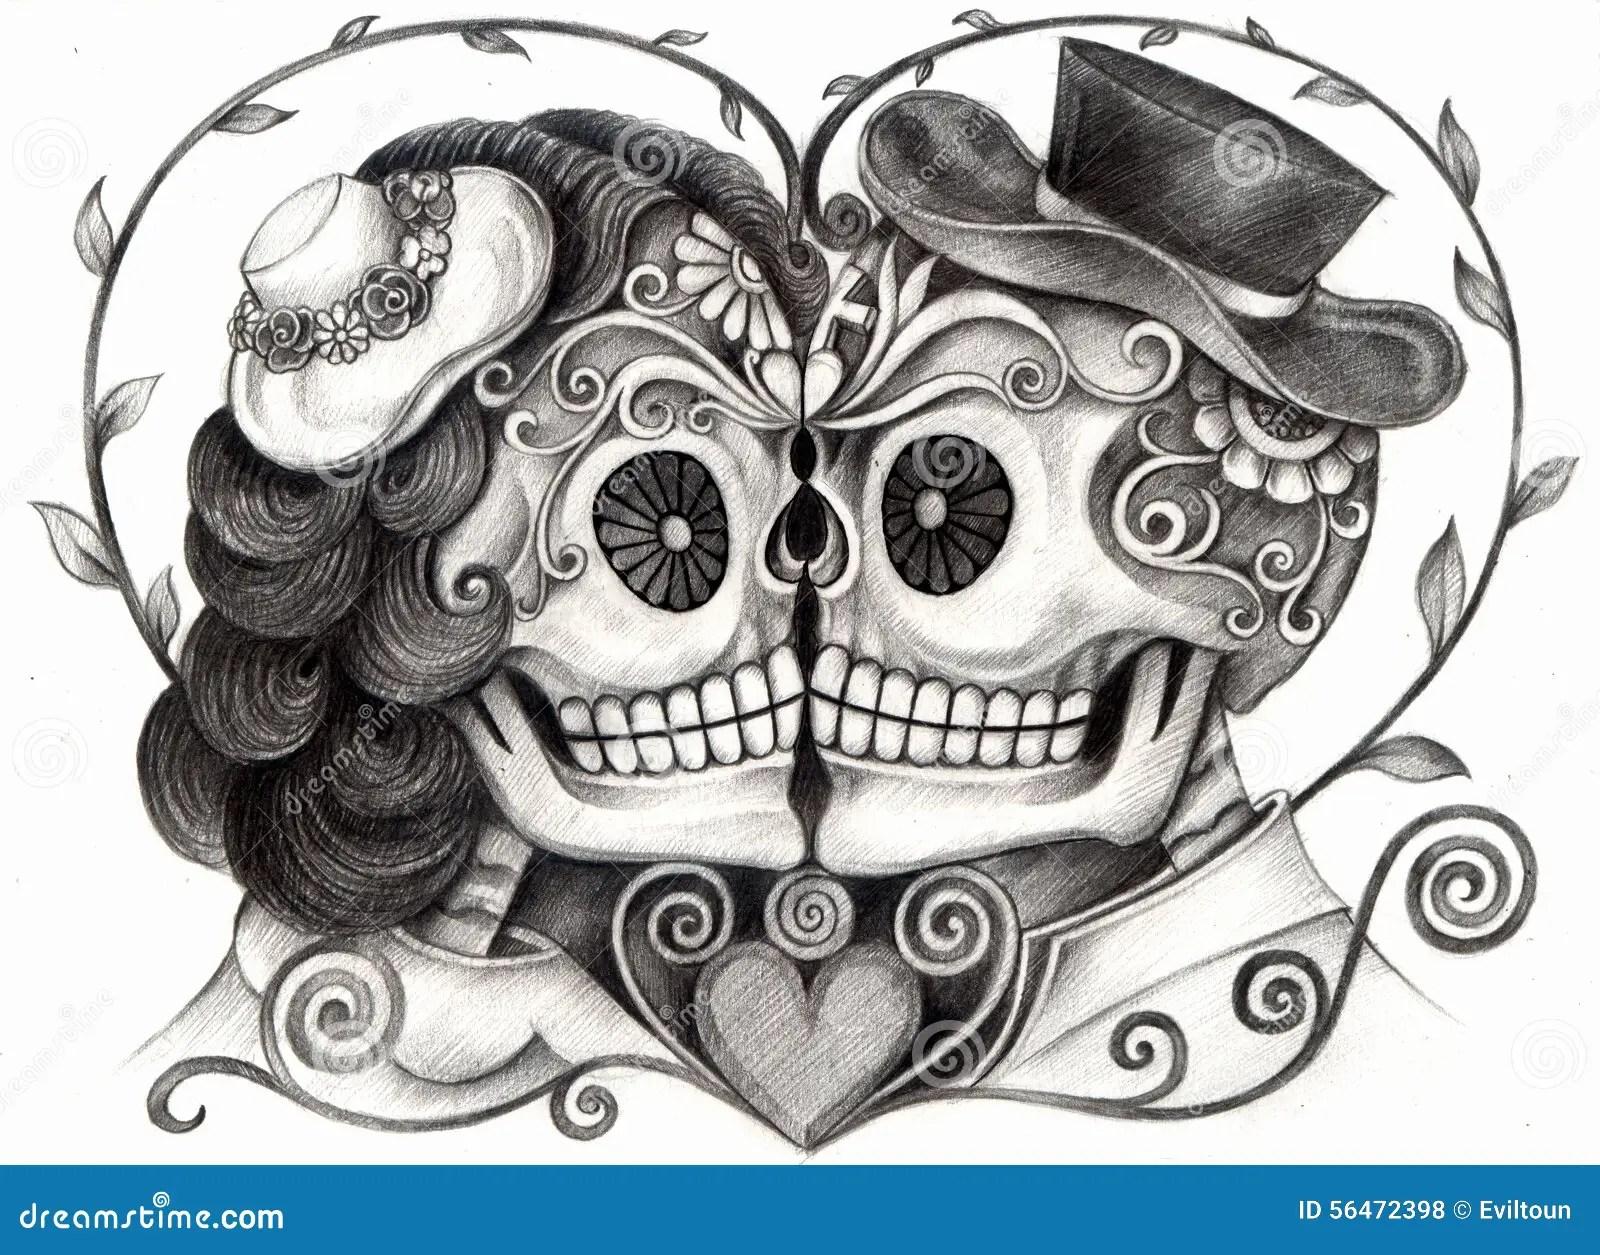 skull wedding invitations skull wedding invitations gothic skull wedding invitations